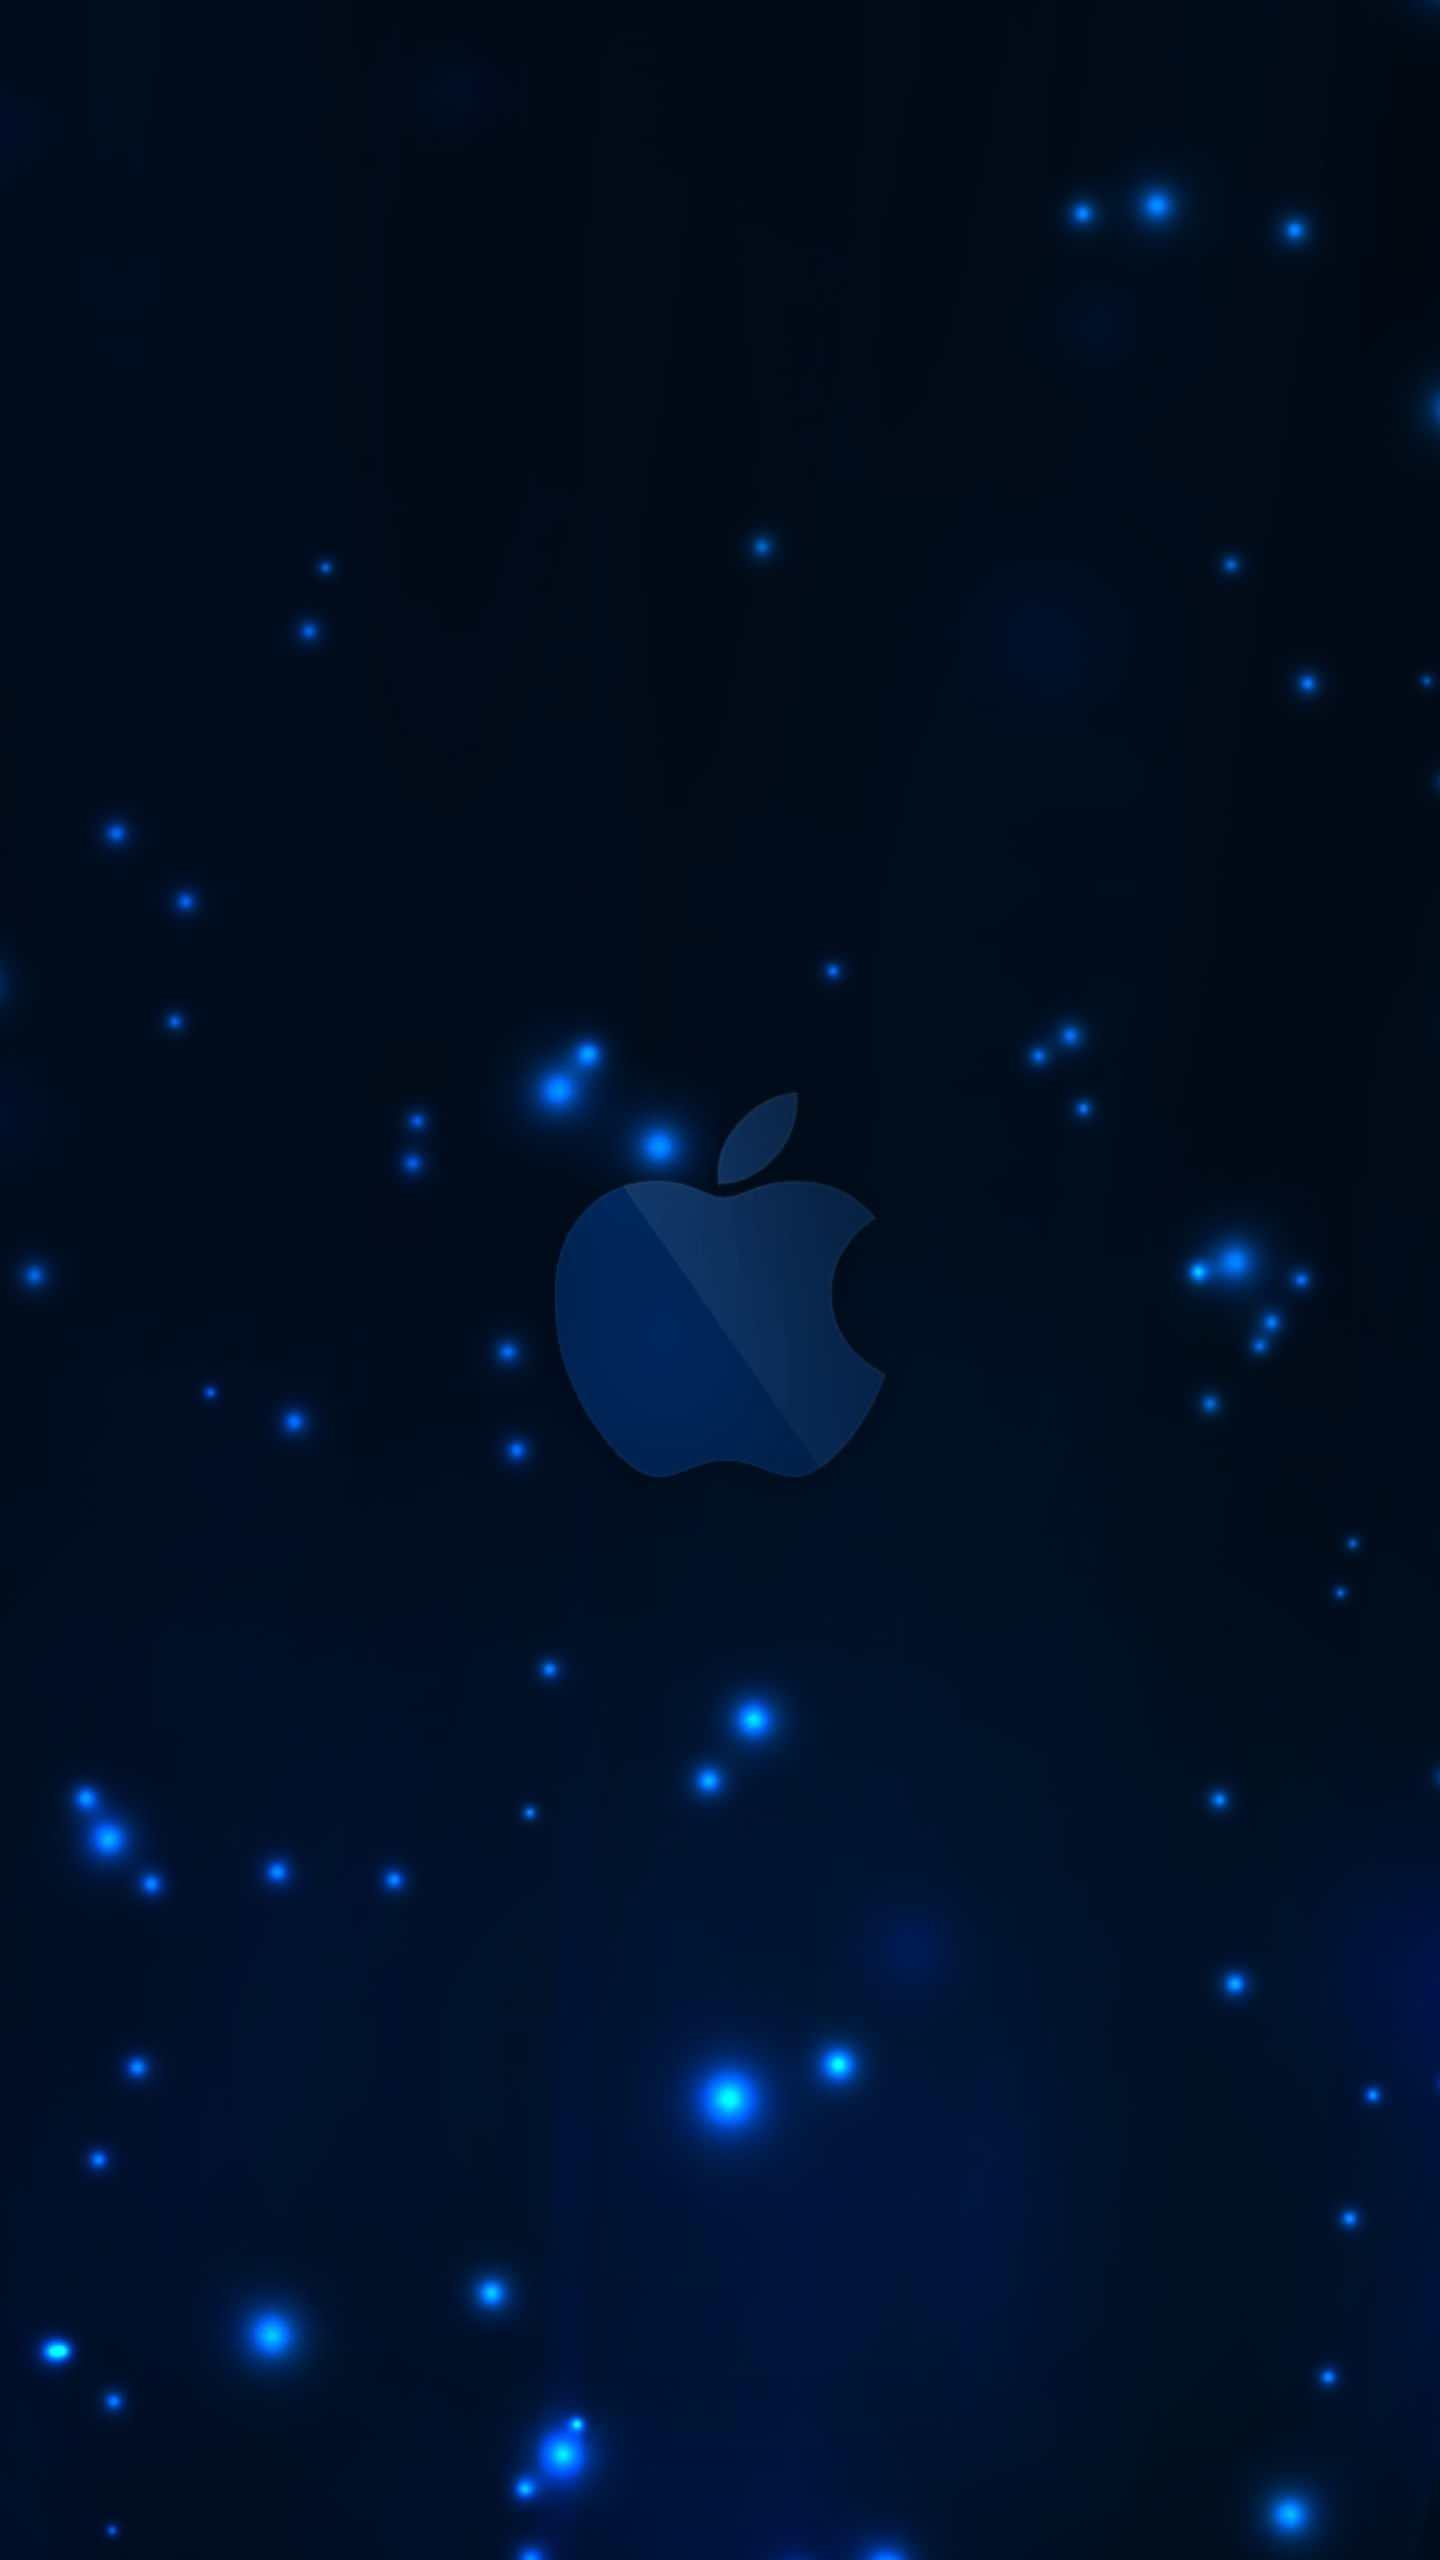 Apple blue wallpapersc SmartPhone 1440x2560